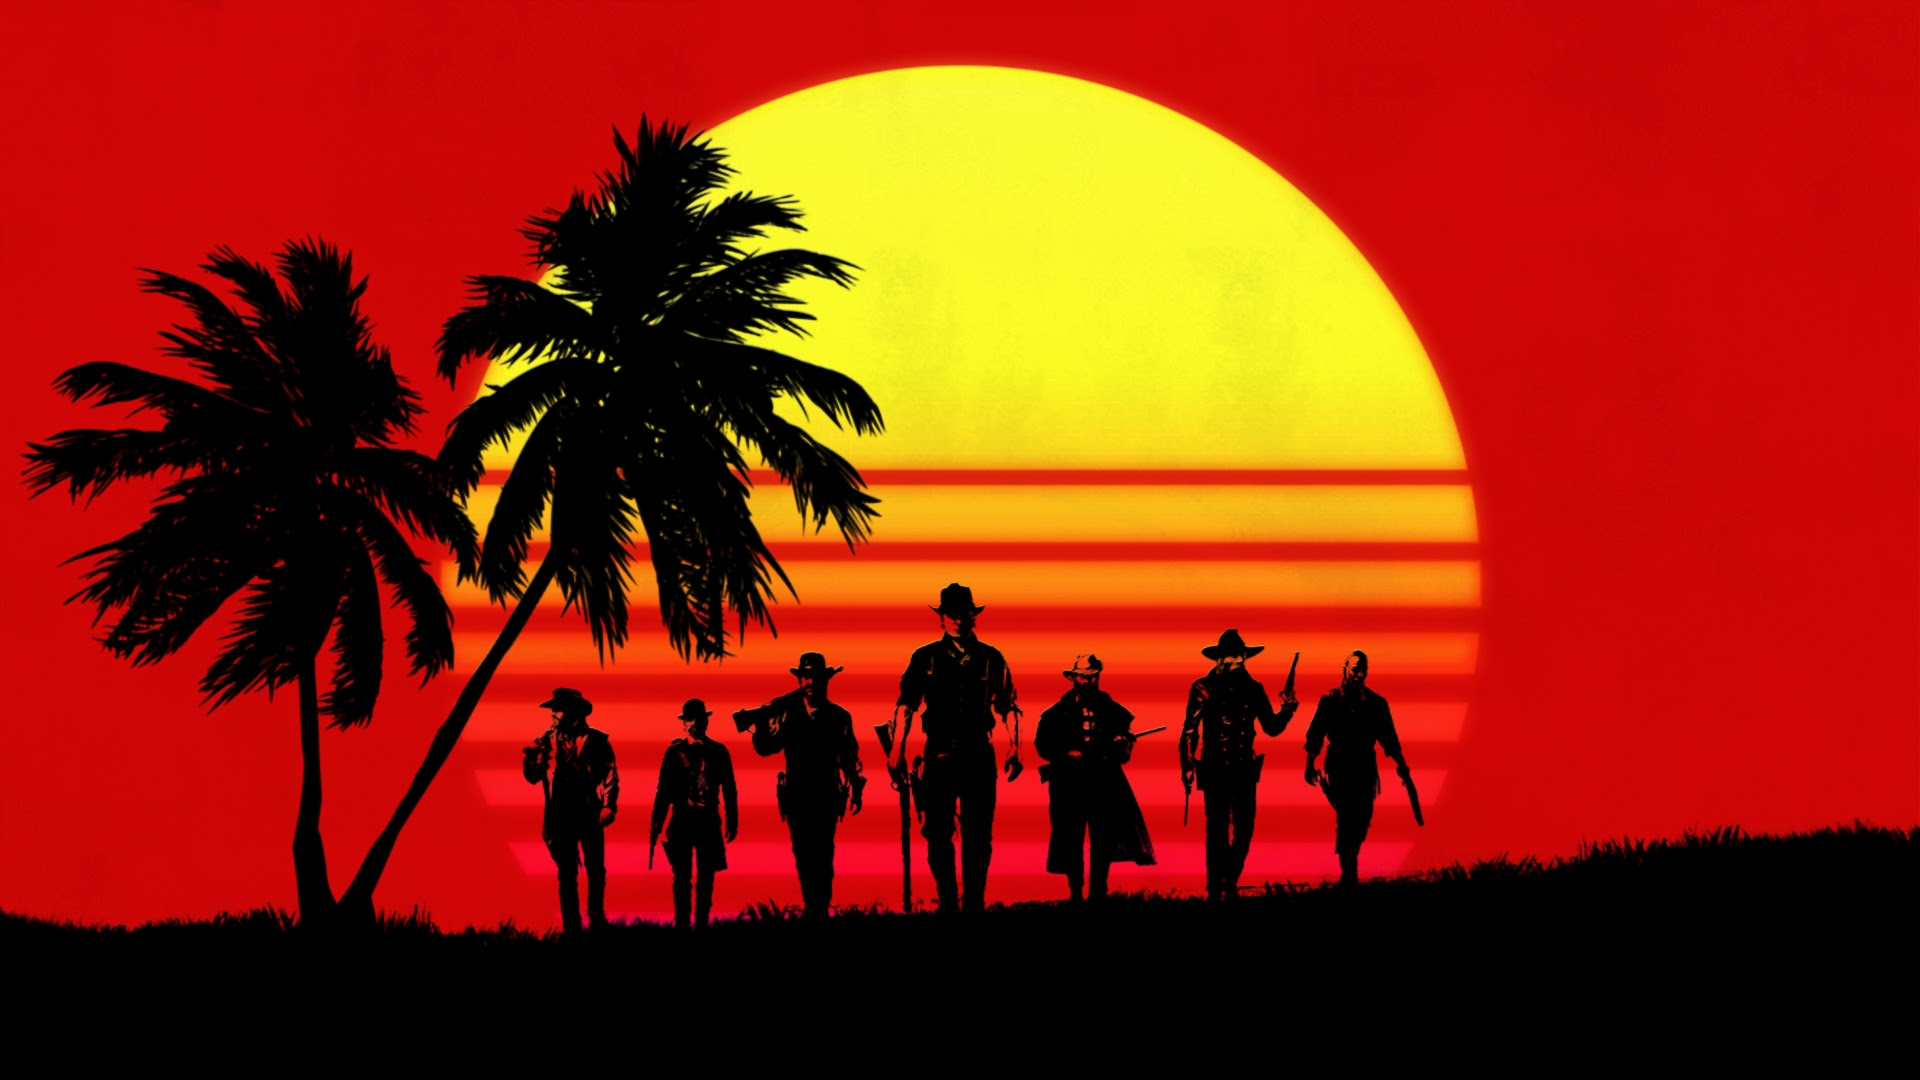 Marston Red Dead Redemption K Hd Desktop Wallpaper For K Ultra